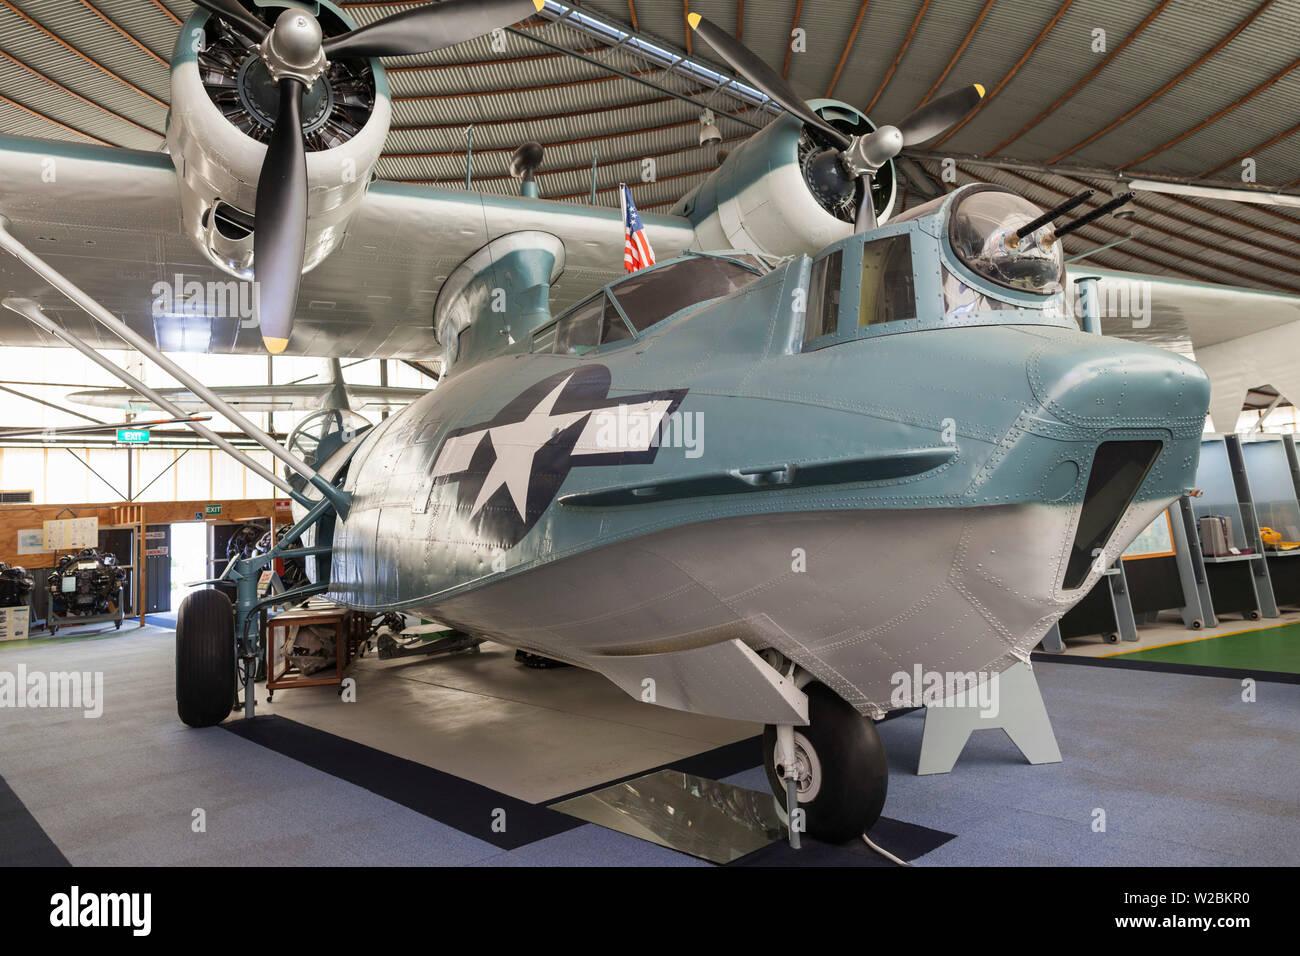 Australia, Western Australia, Bull Creek, RAAF Aviation Heritage Museum, WW2-era PBY Catalina seaplane Stock Photo